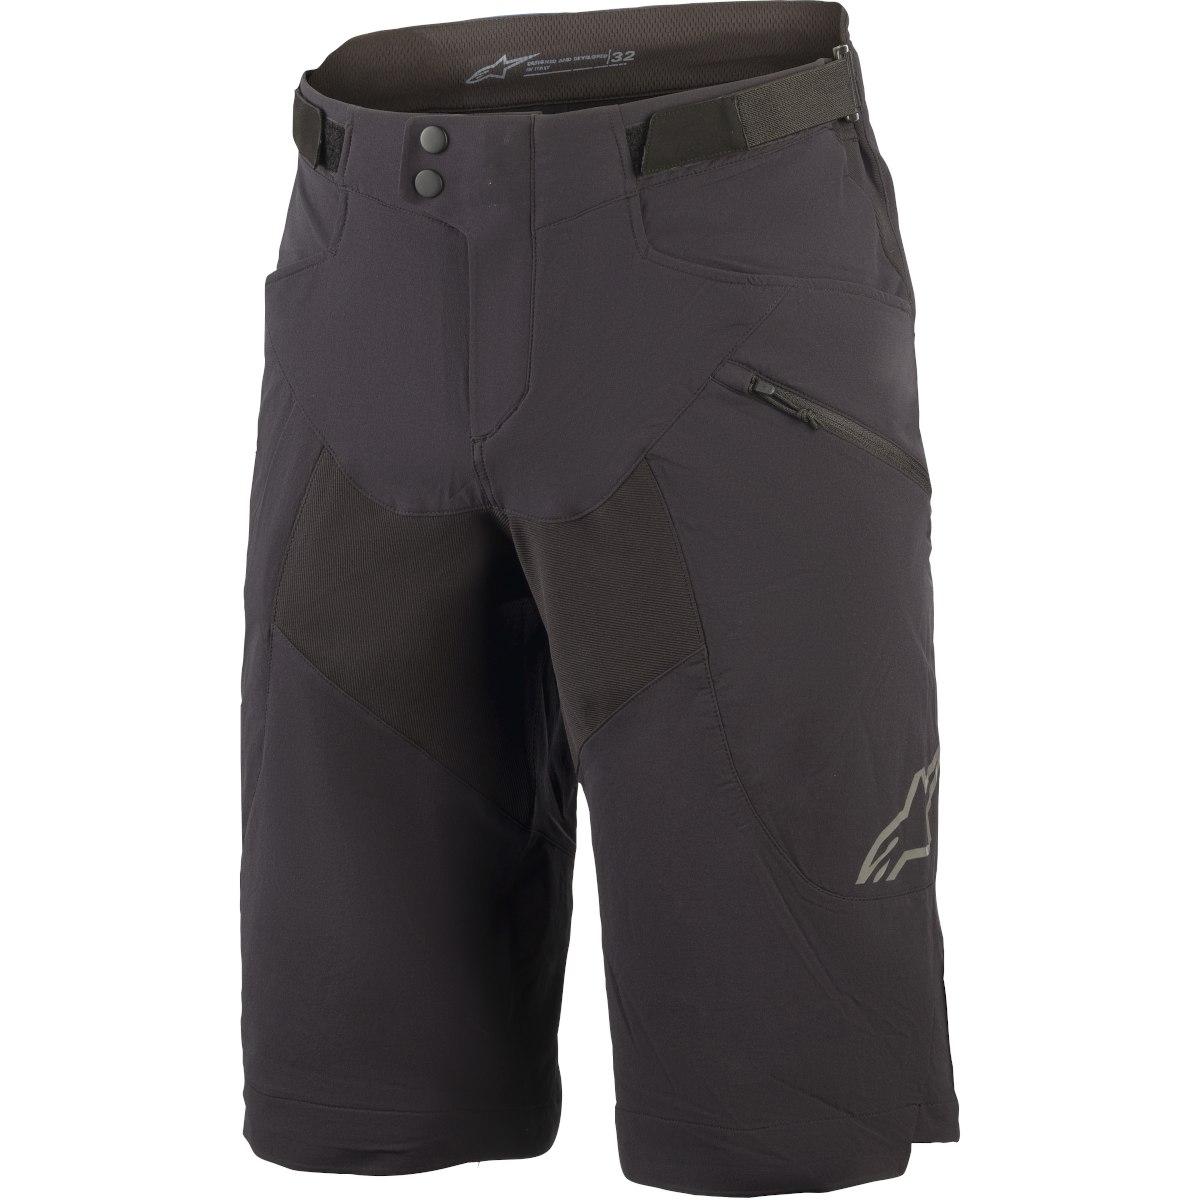 Alpinestars Drop 6.0 Shorts - black